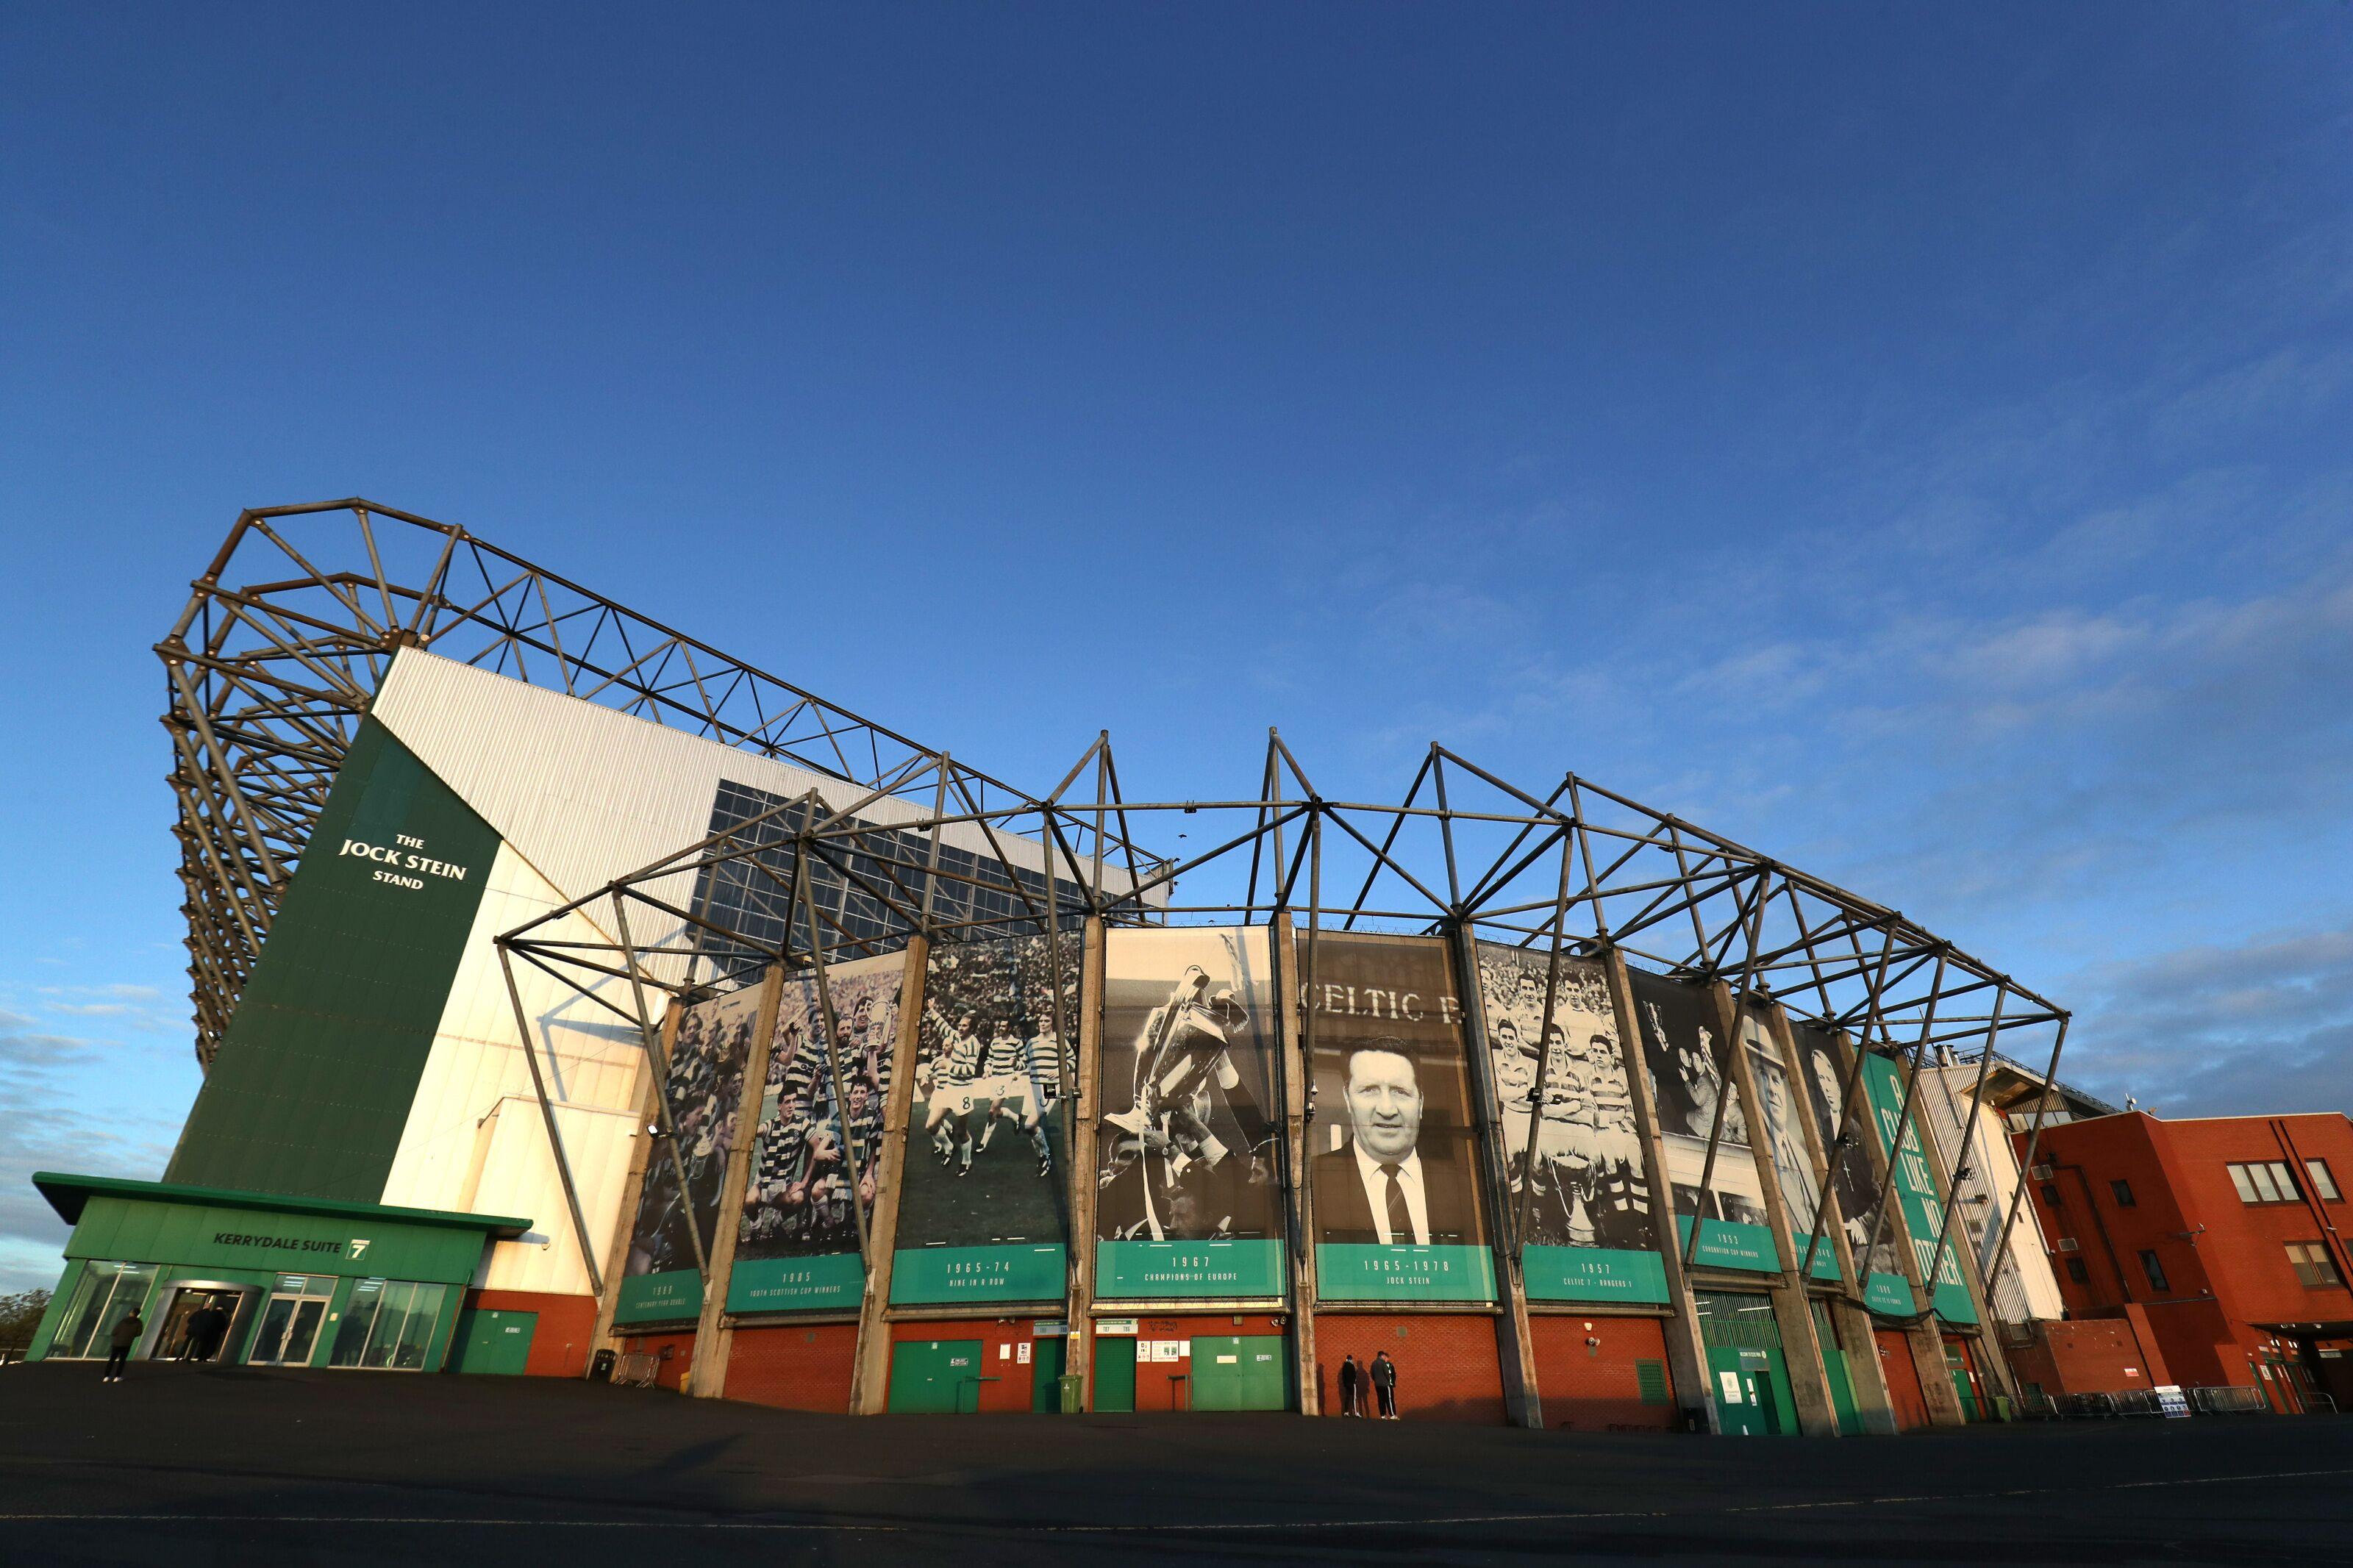 How to watch Kilmarnock v Celtic: TV channel, live stream